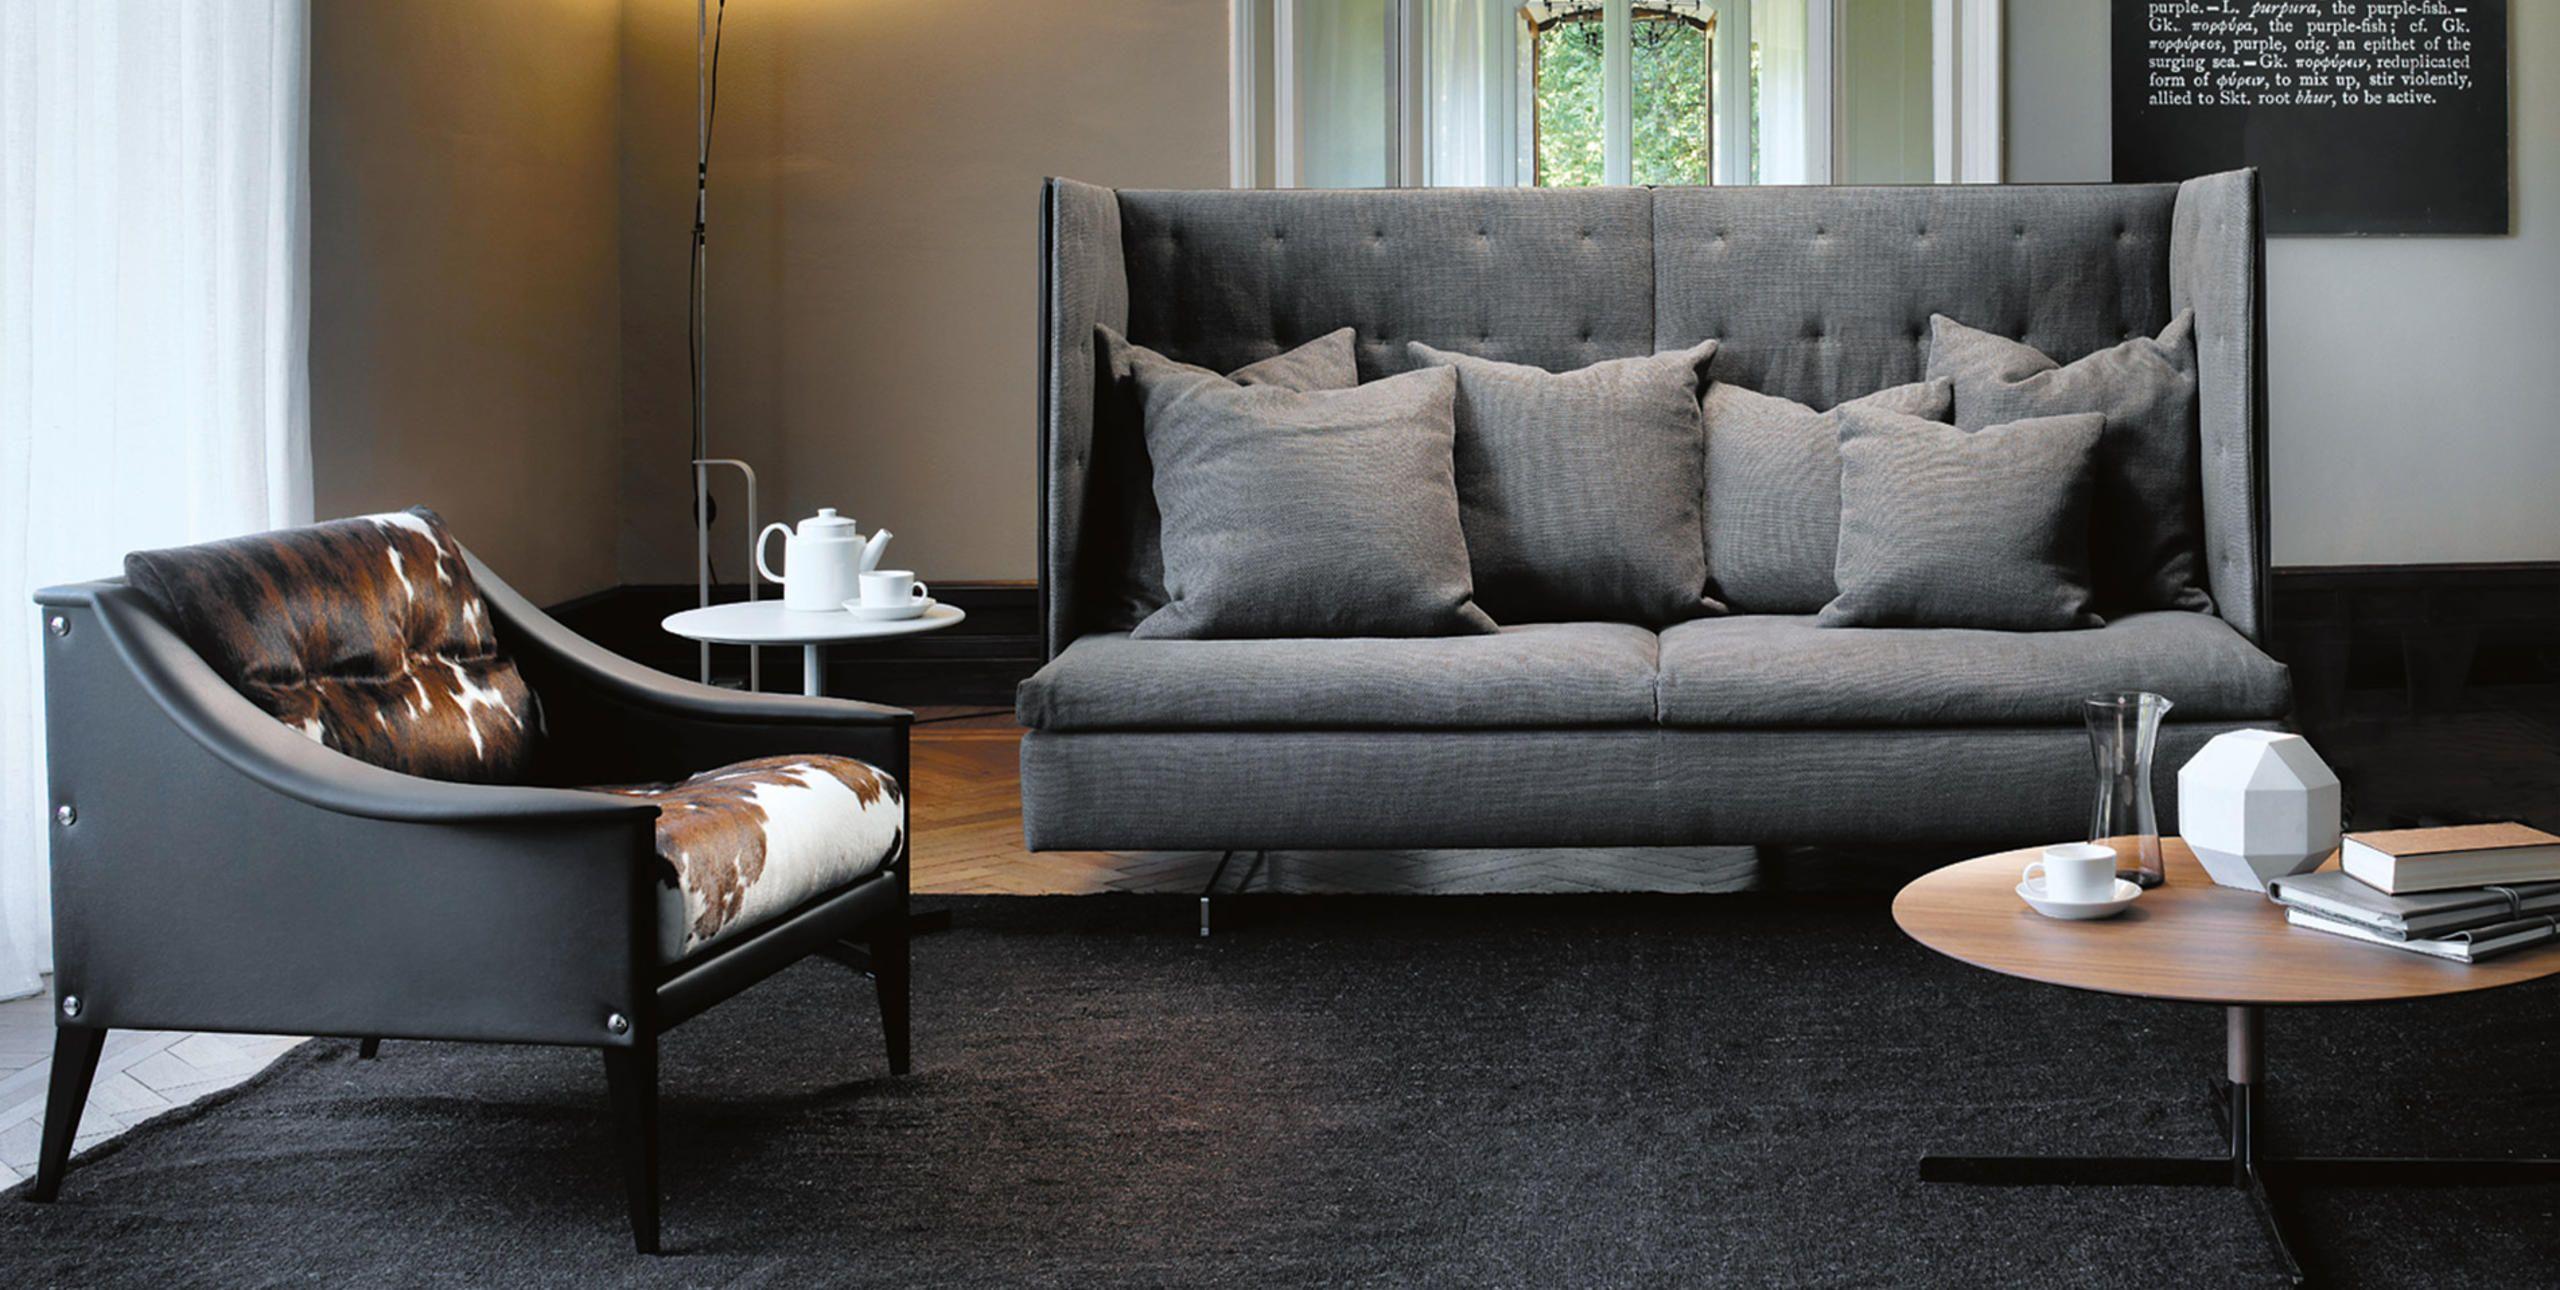 poltrona frau sofa kennedee mini bed olx grantorino hb by via designresource